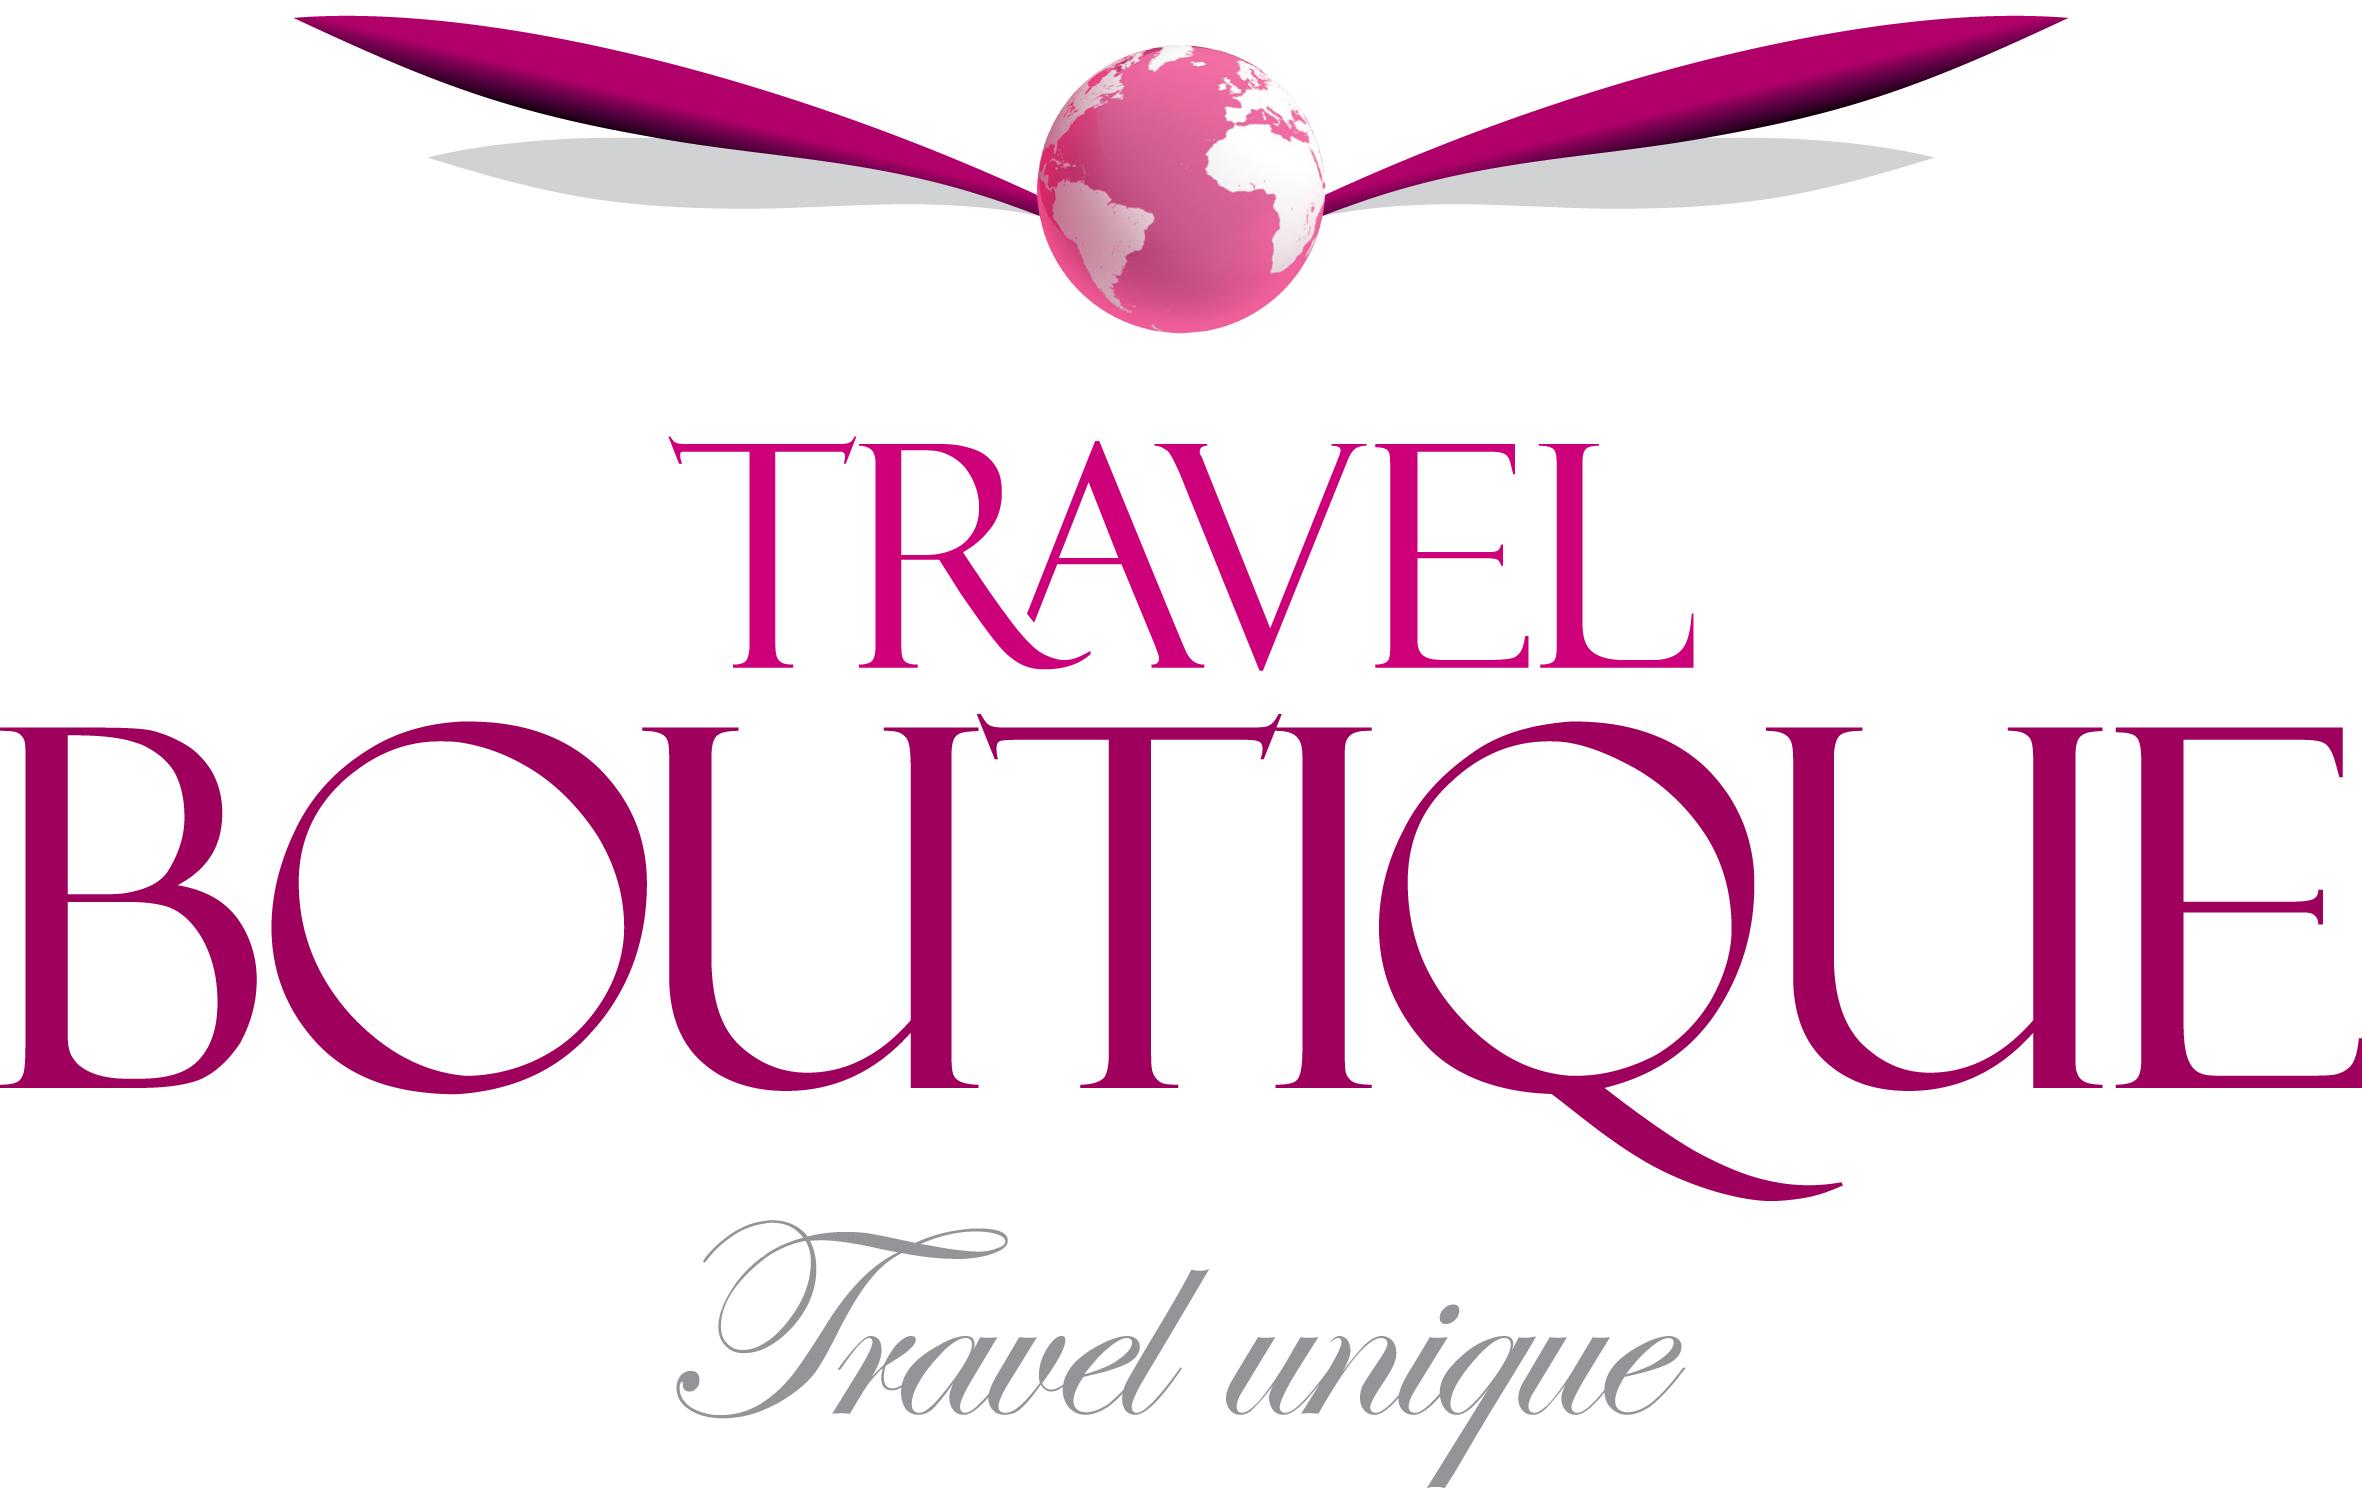 Travel boutique doo